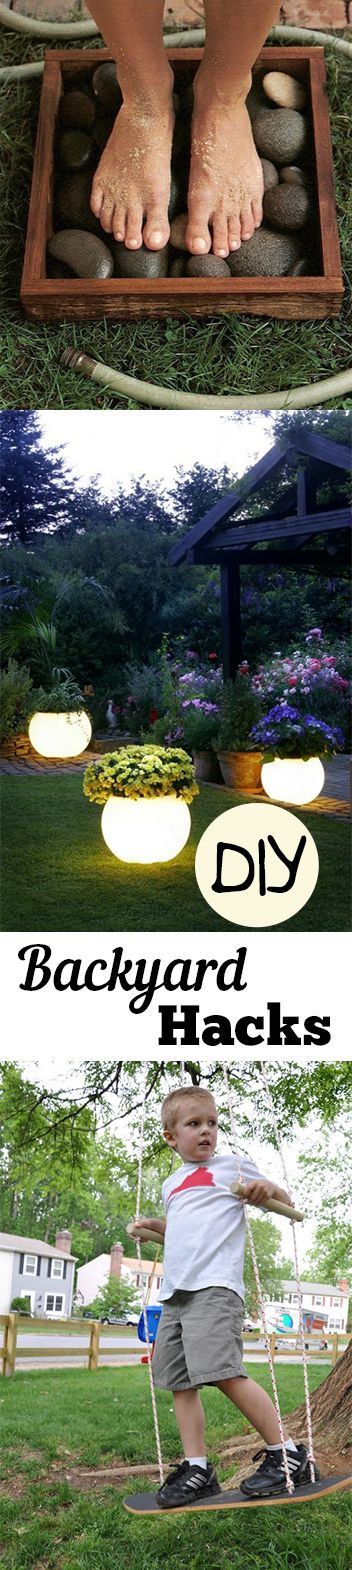 DIY Backyard Hacks